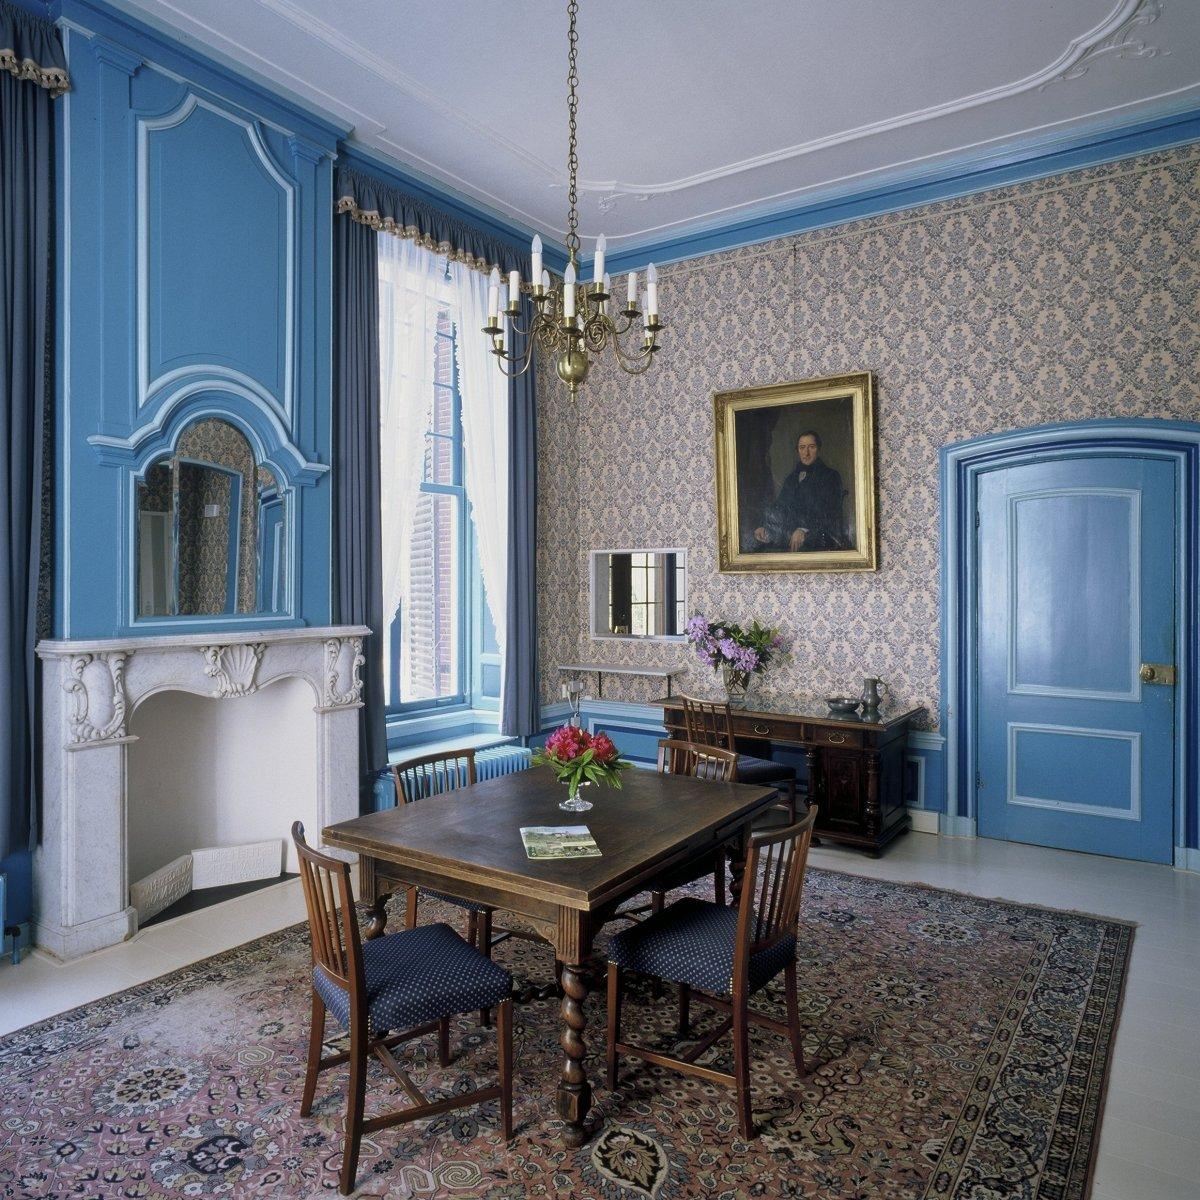 File interieur blauwe kamer arnhem 20424525 wikimedia commons - Blauwe kamer ...